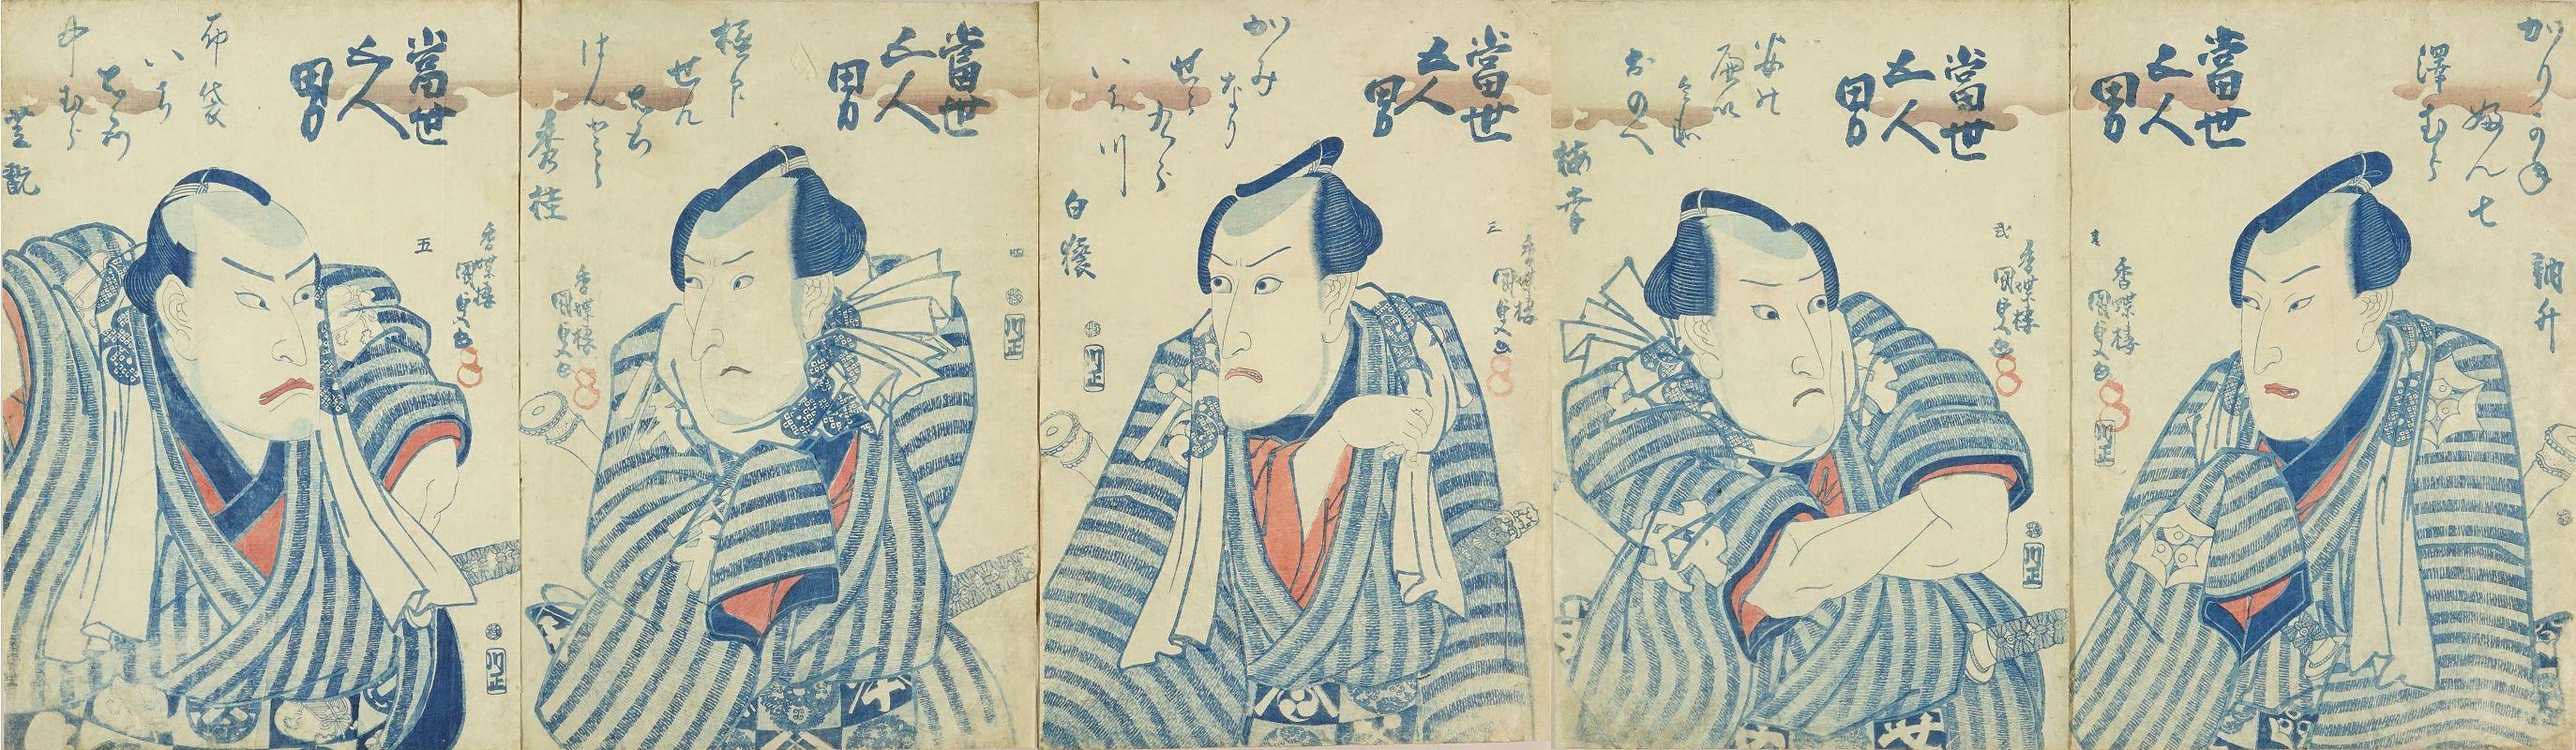 KUNISADA <i>Aizuri-e</i> (Blue printed picture) of five braveries, five sheets, complete